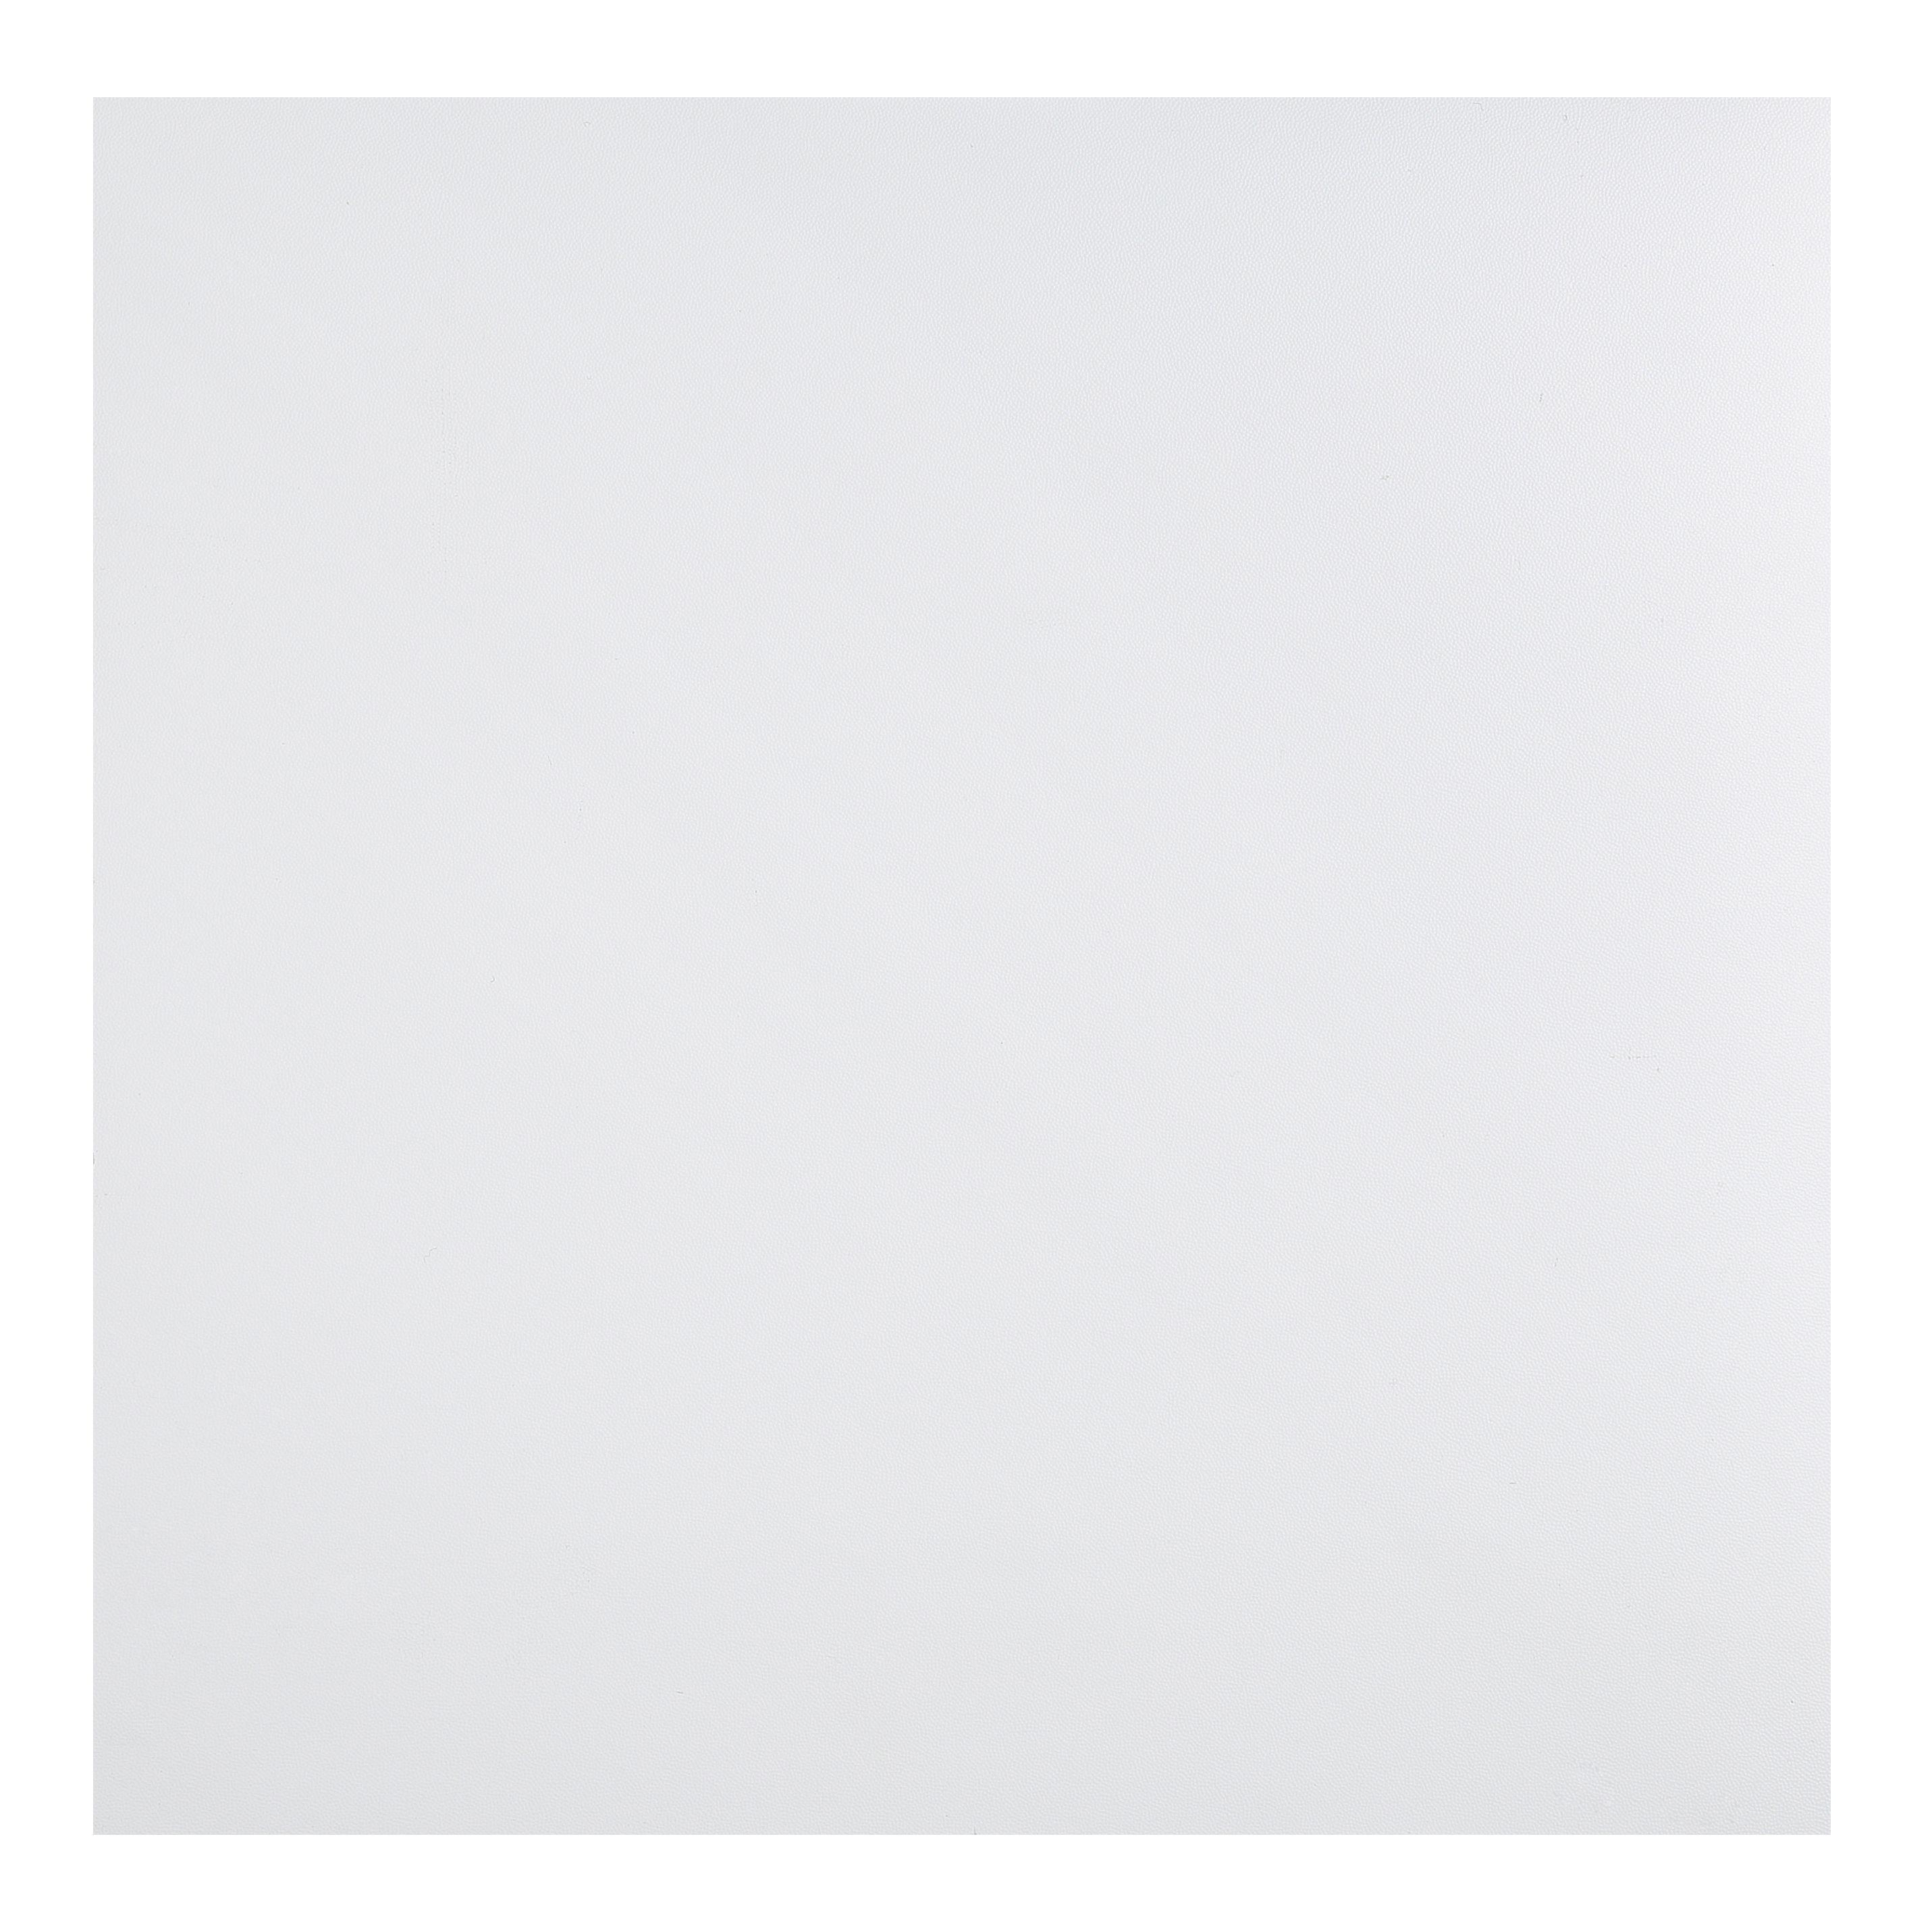 B&Q White Marble Effect Self Adhesive Vinyl Tile 1.02m²